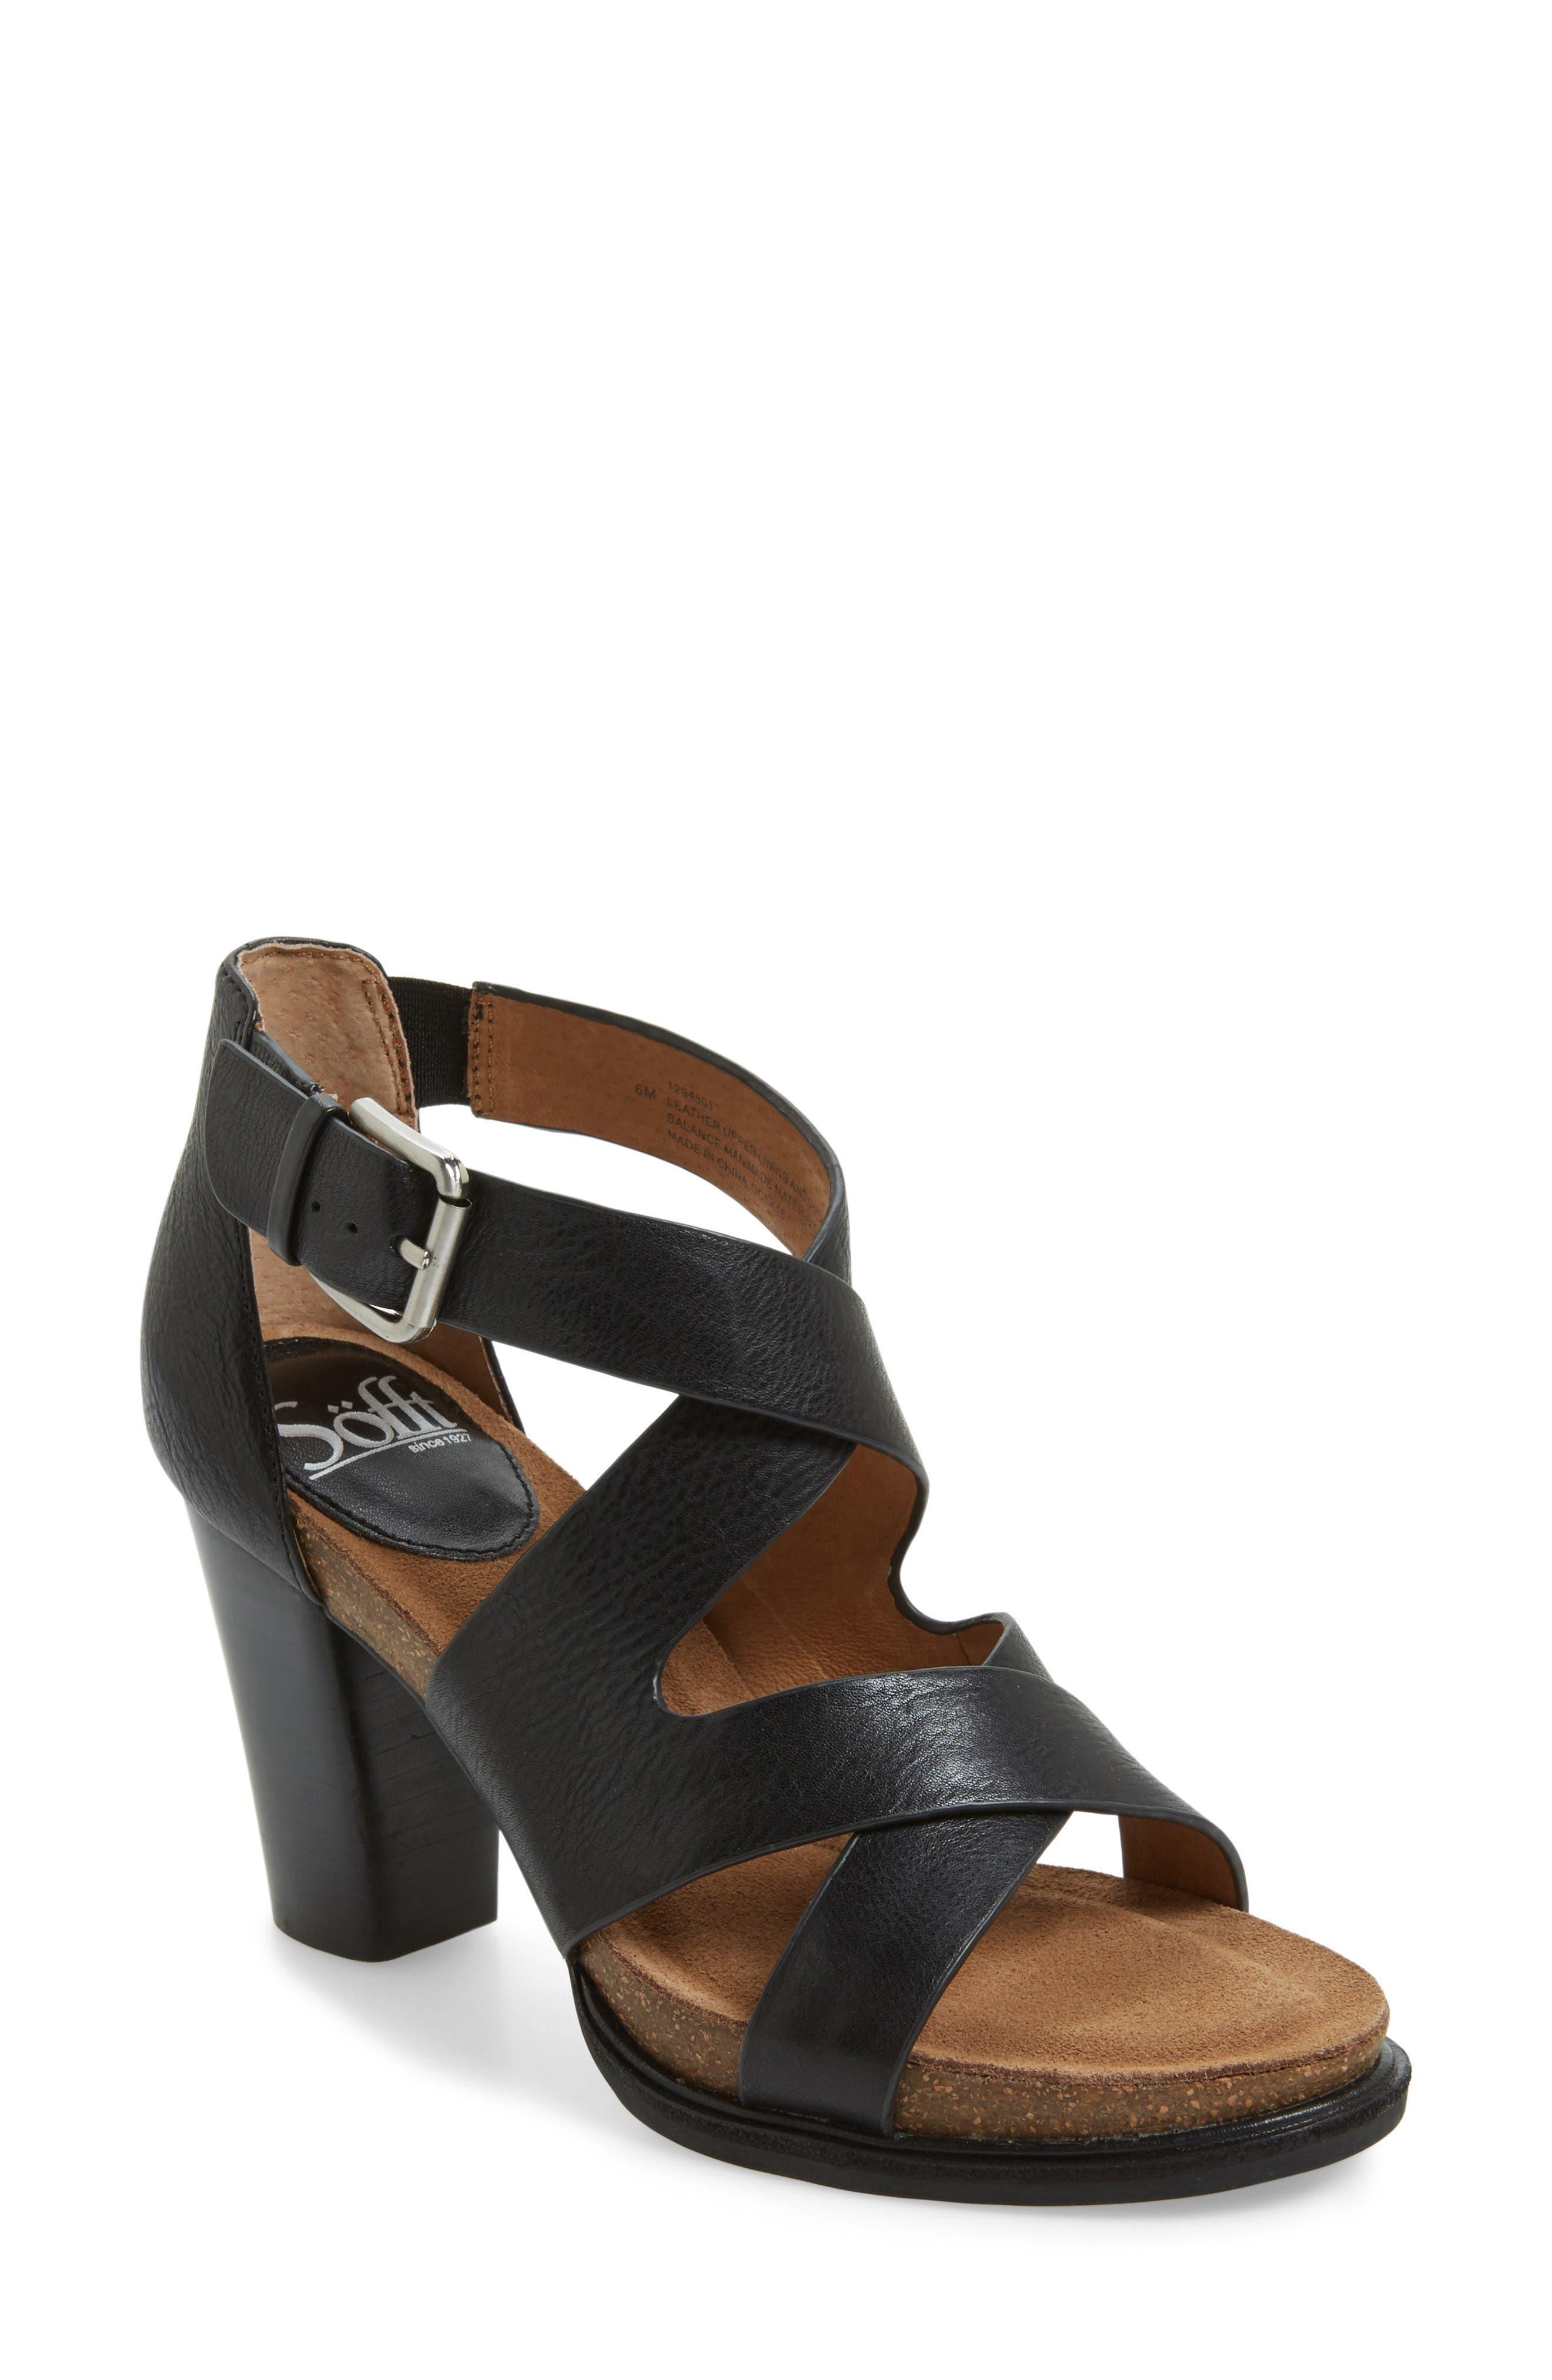 Canita Block Heel Sandal,                             Main thumbnail 1, color,                             Black Leather